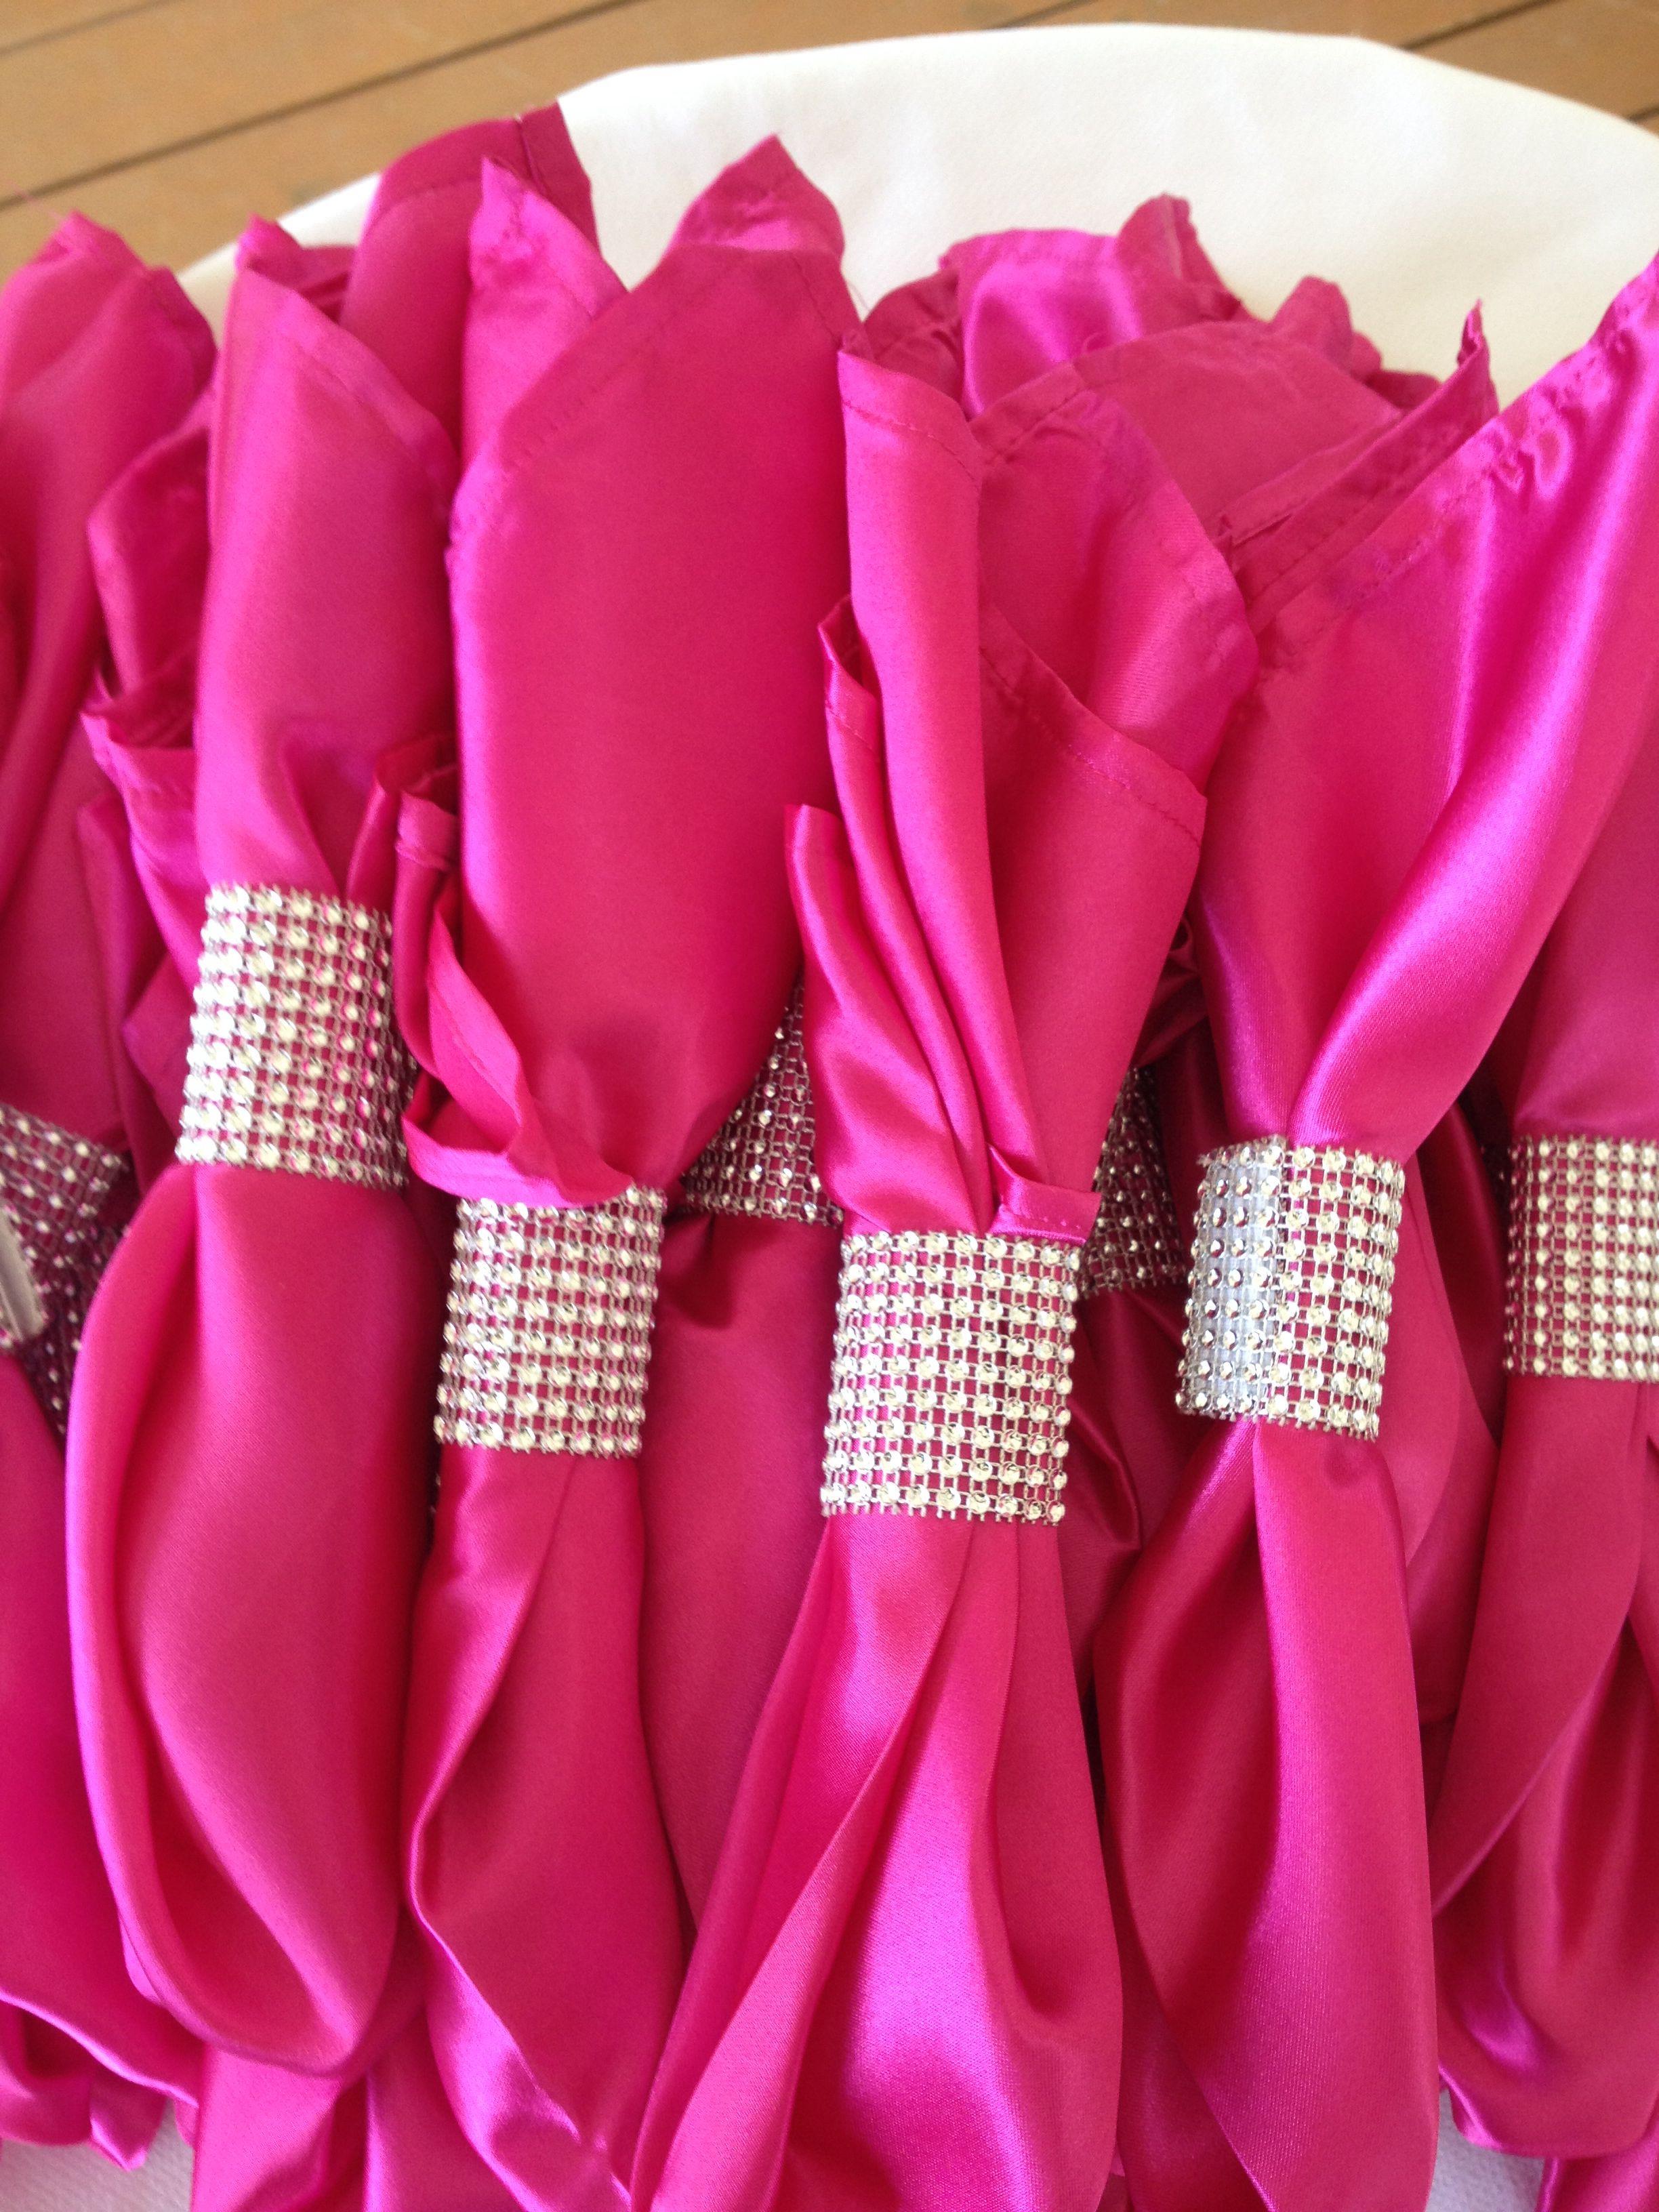 Diamond ribbon napkin rings with fuchsia satin napkins by Helen G ...